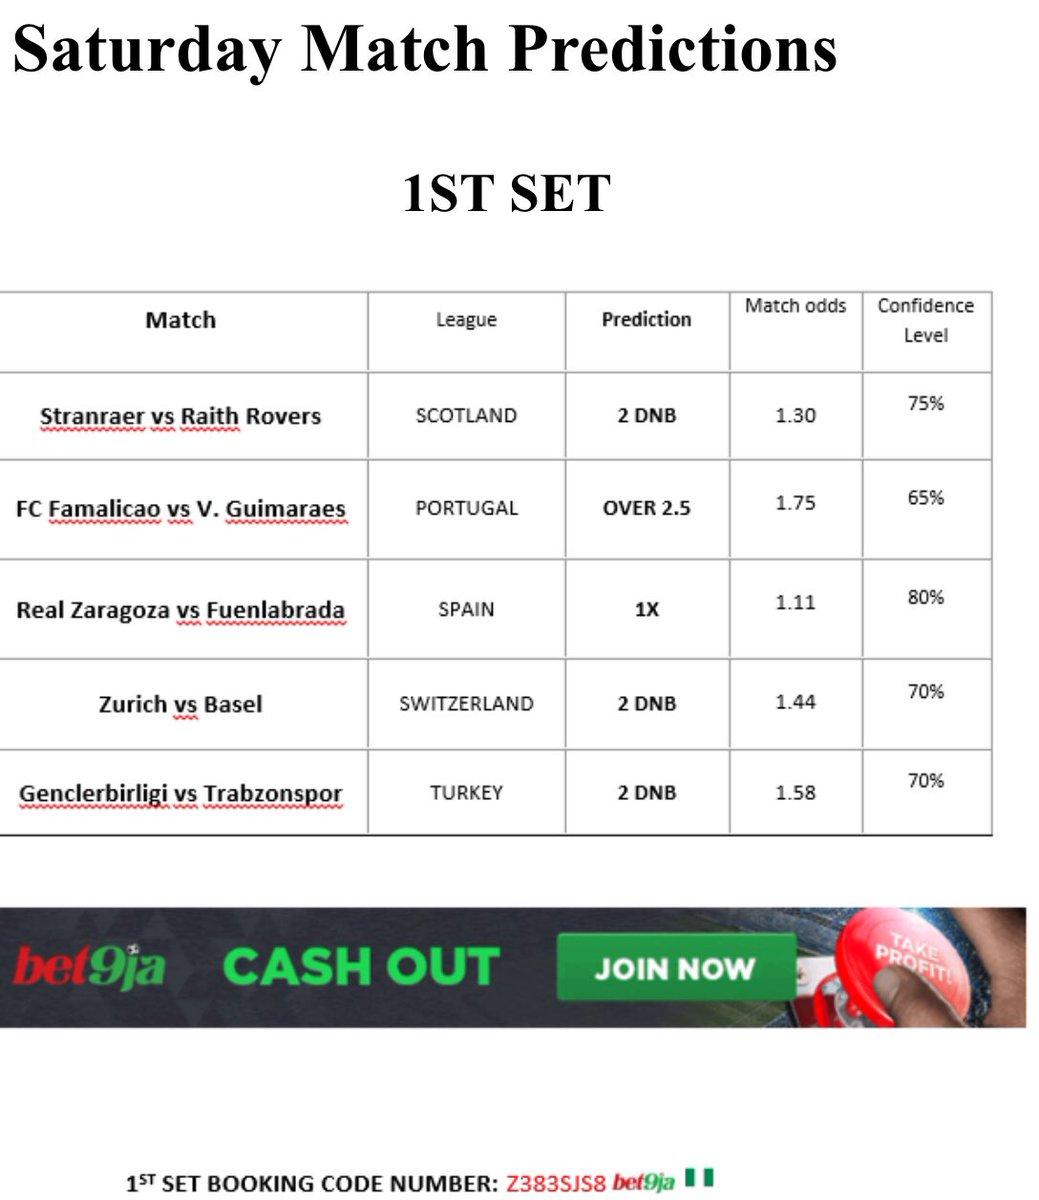 Kings sports betting odds uganda 0xca binary options